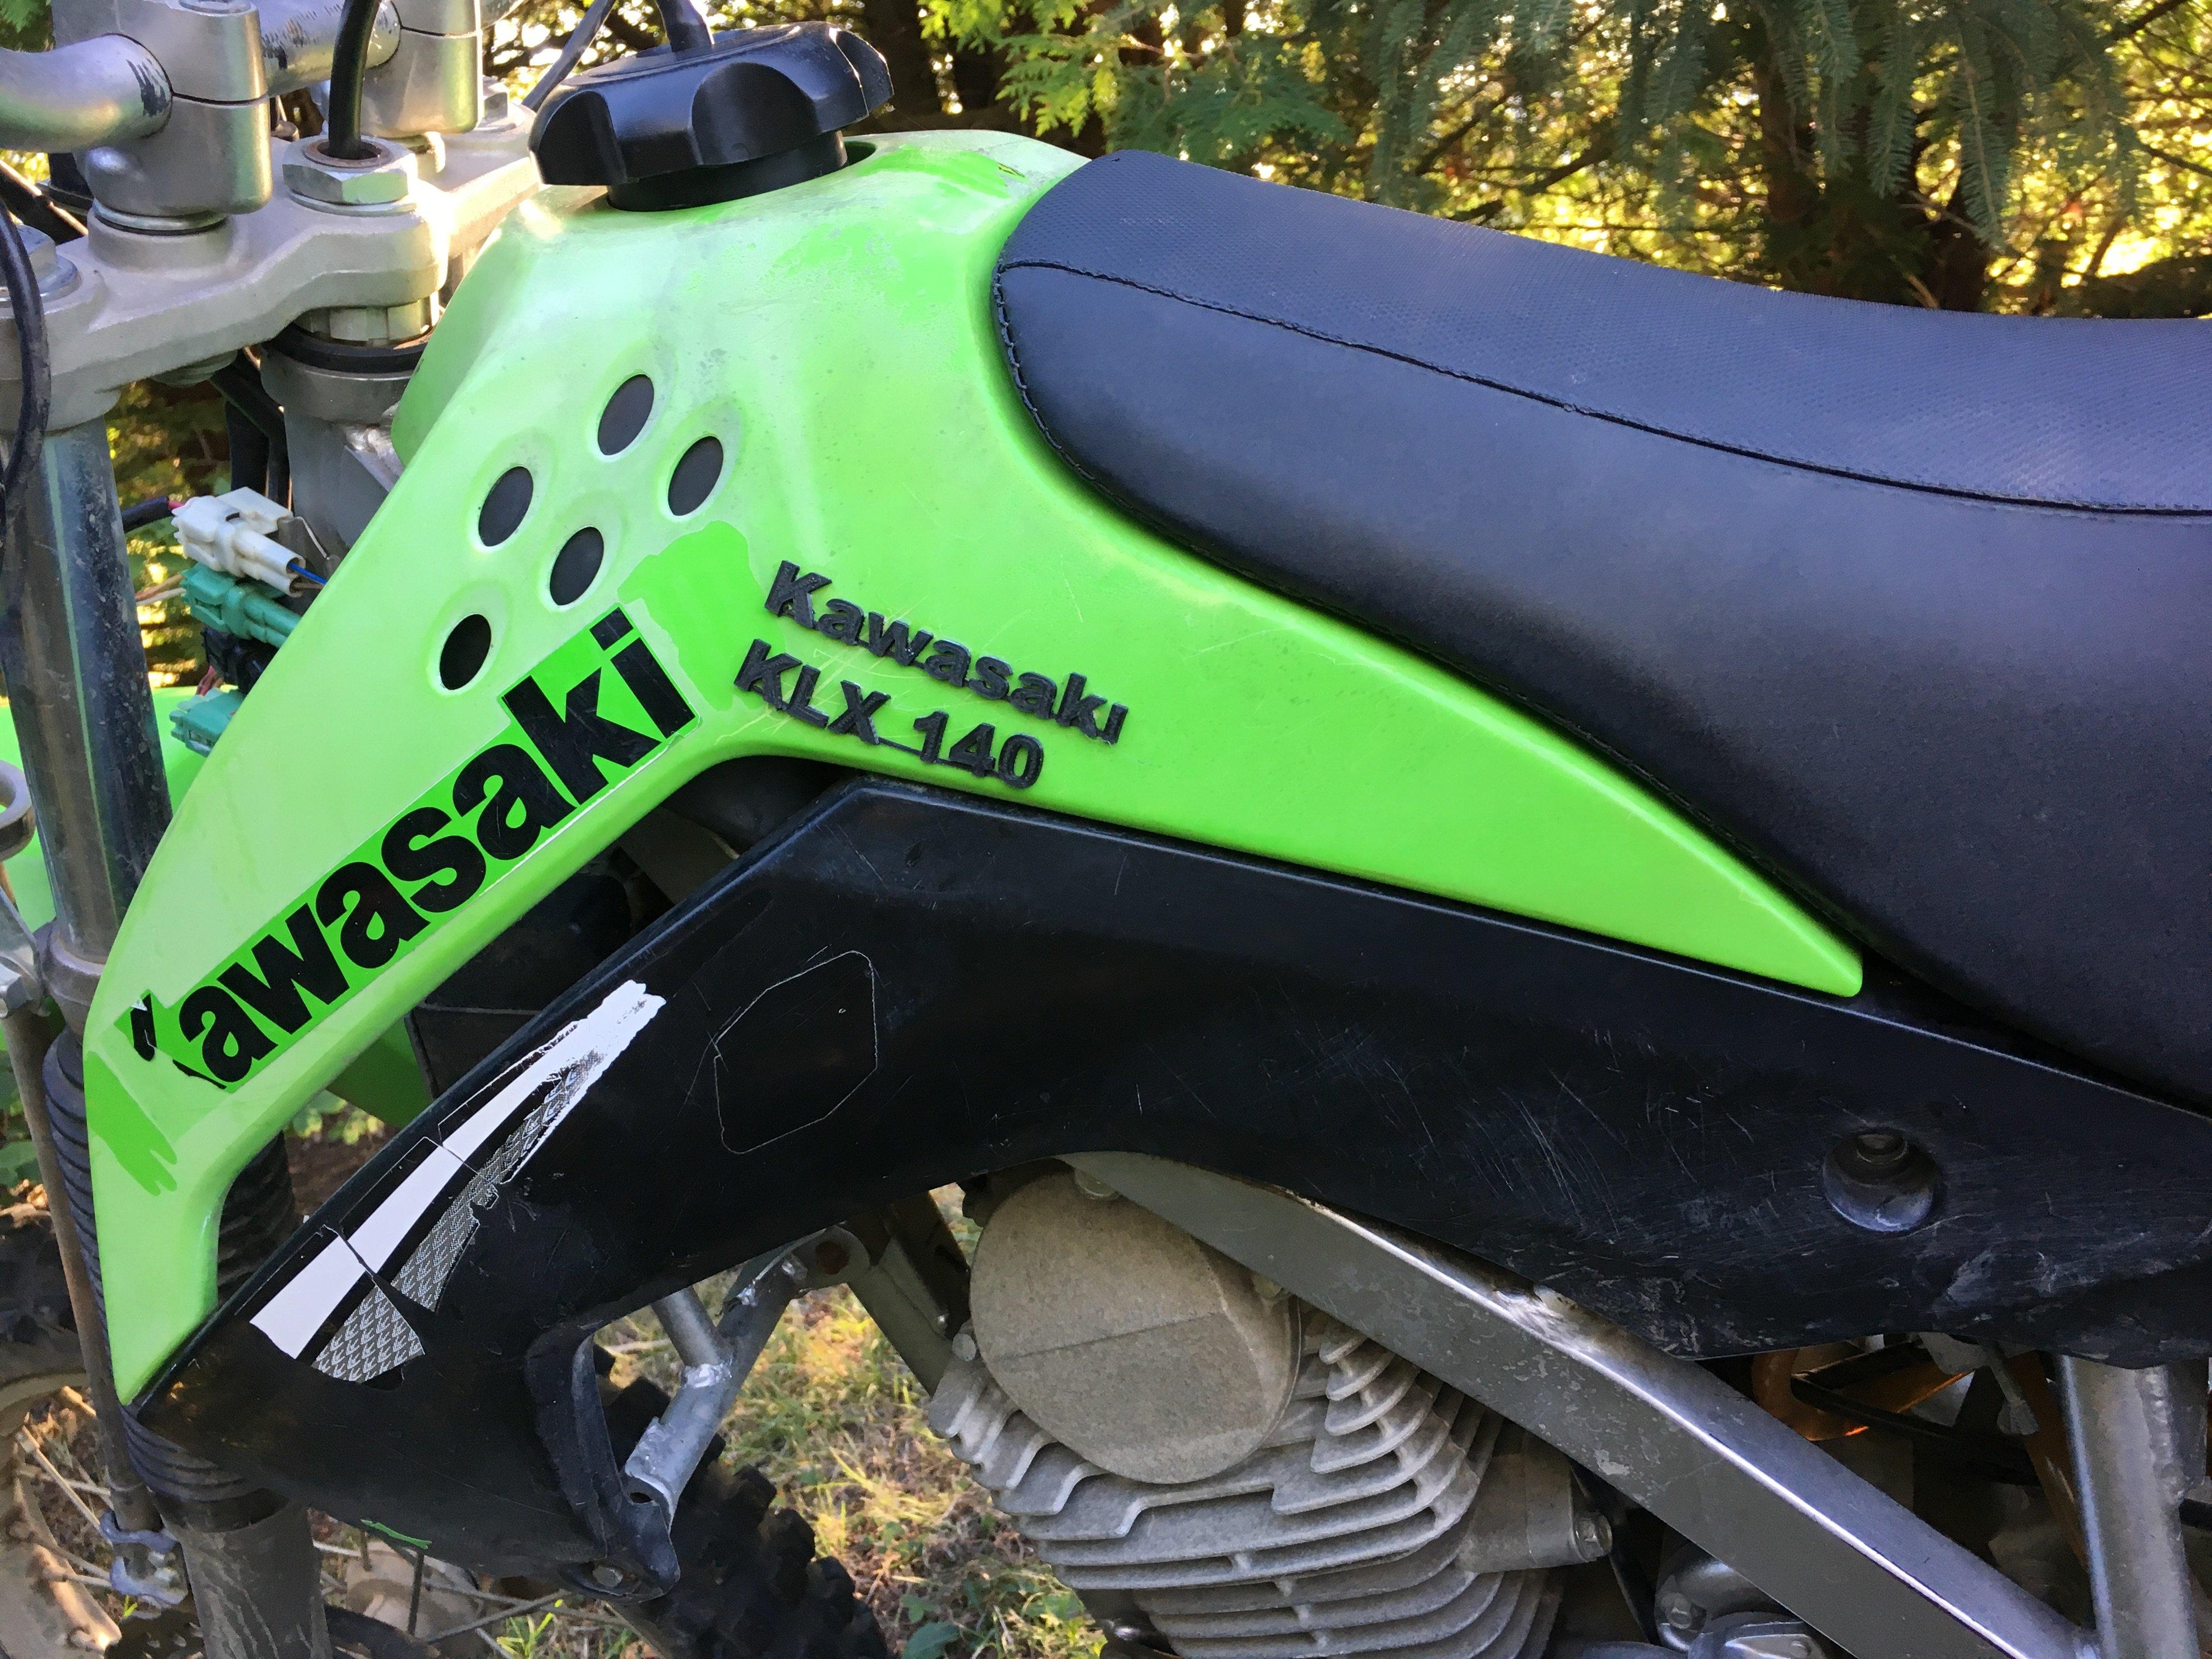 Kawasaki Labels for KLX 140 Dirt bike